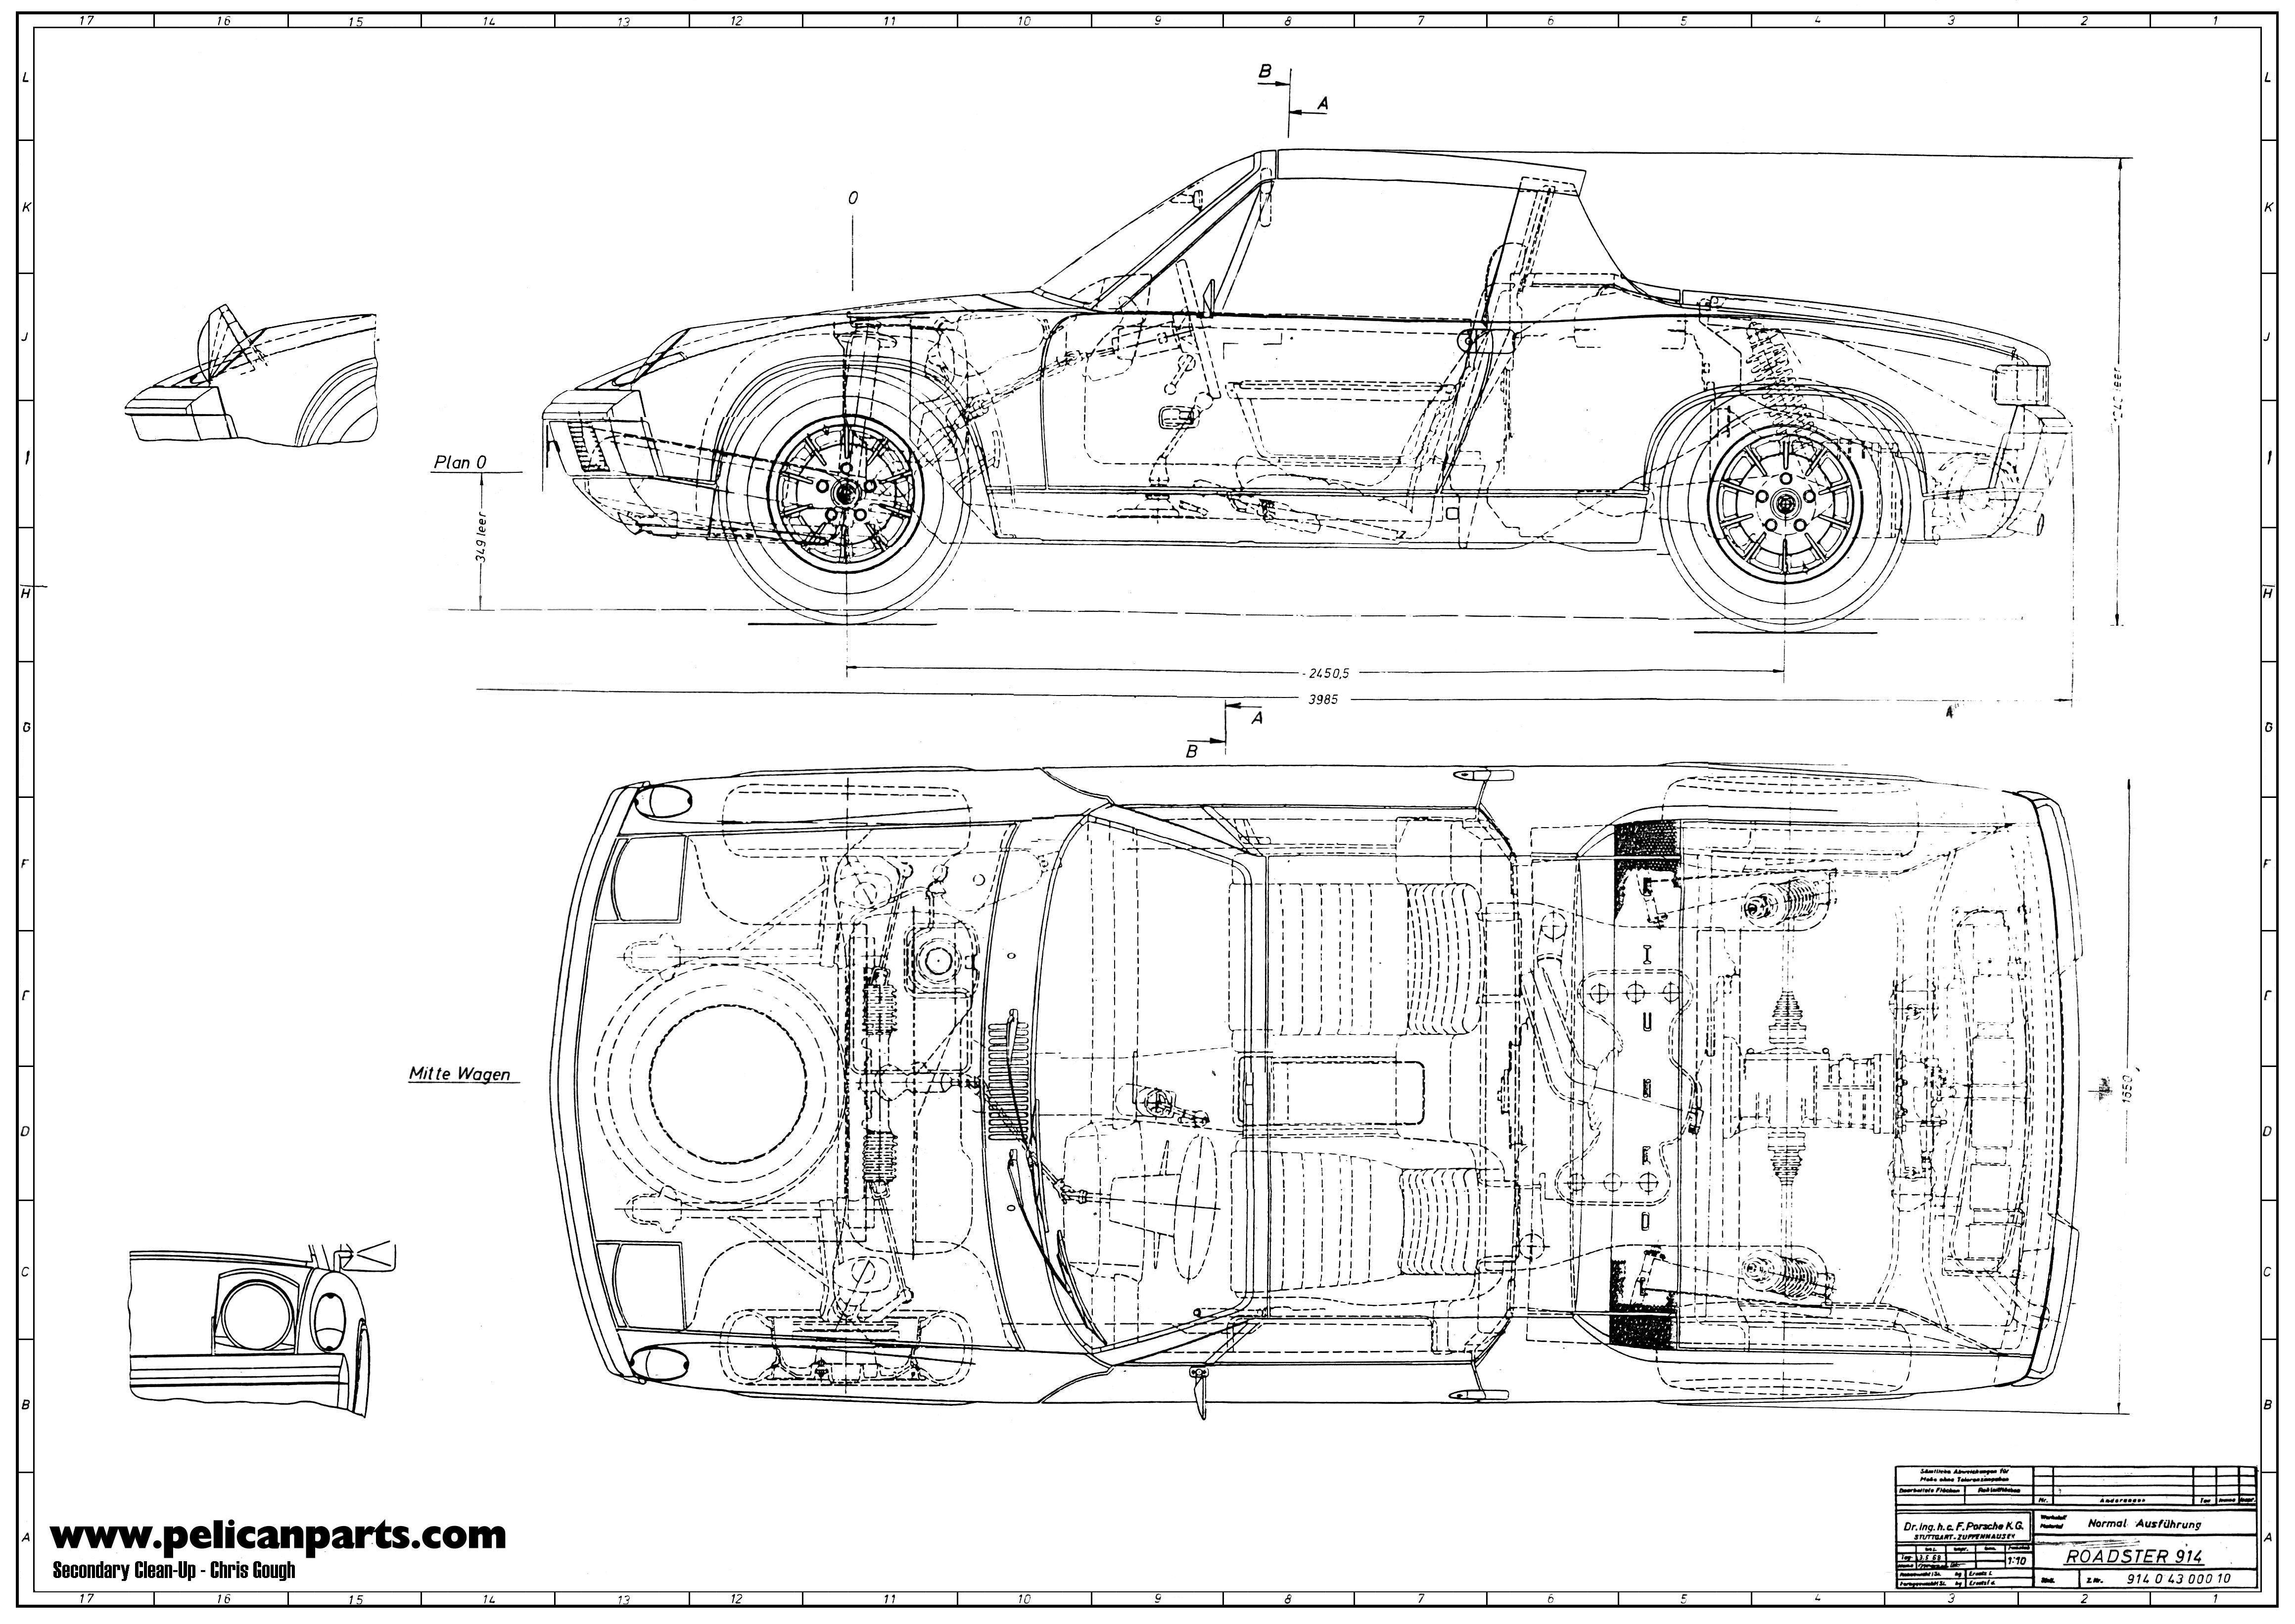 Car Engine Blueprints - Dolgular.com